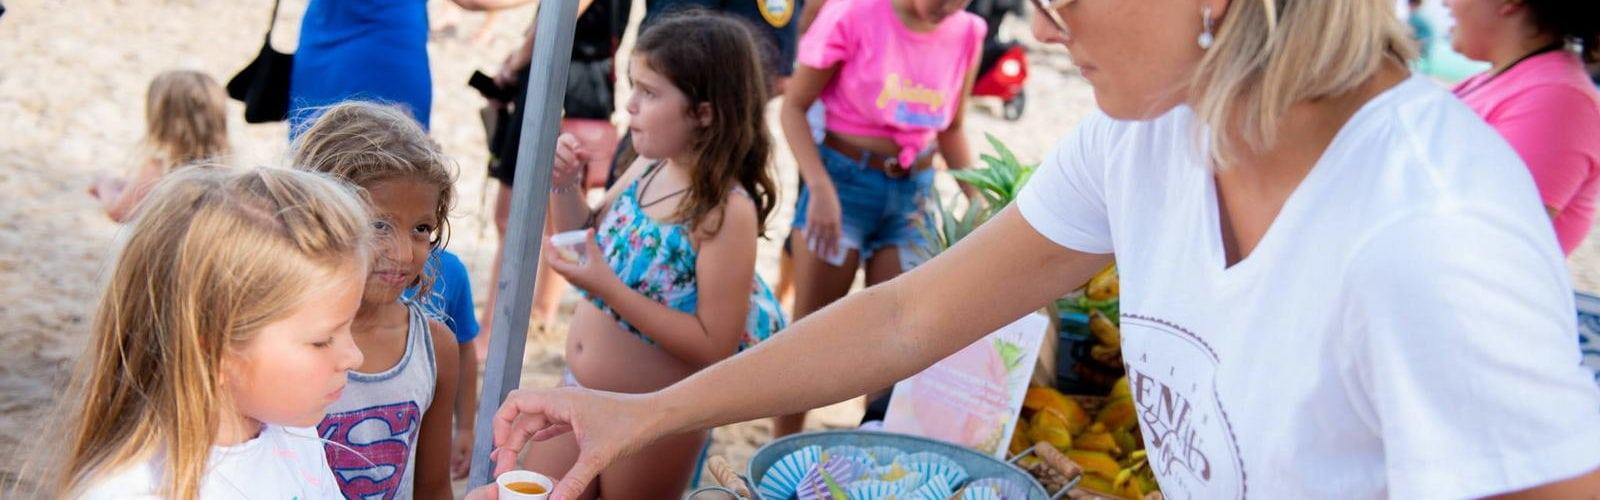 evenement-endless-summer-maison-meneau-usa-boissons-bio-organic-une